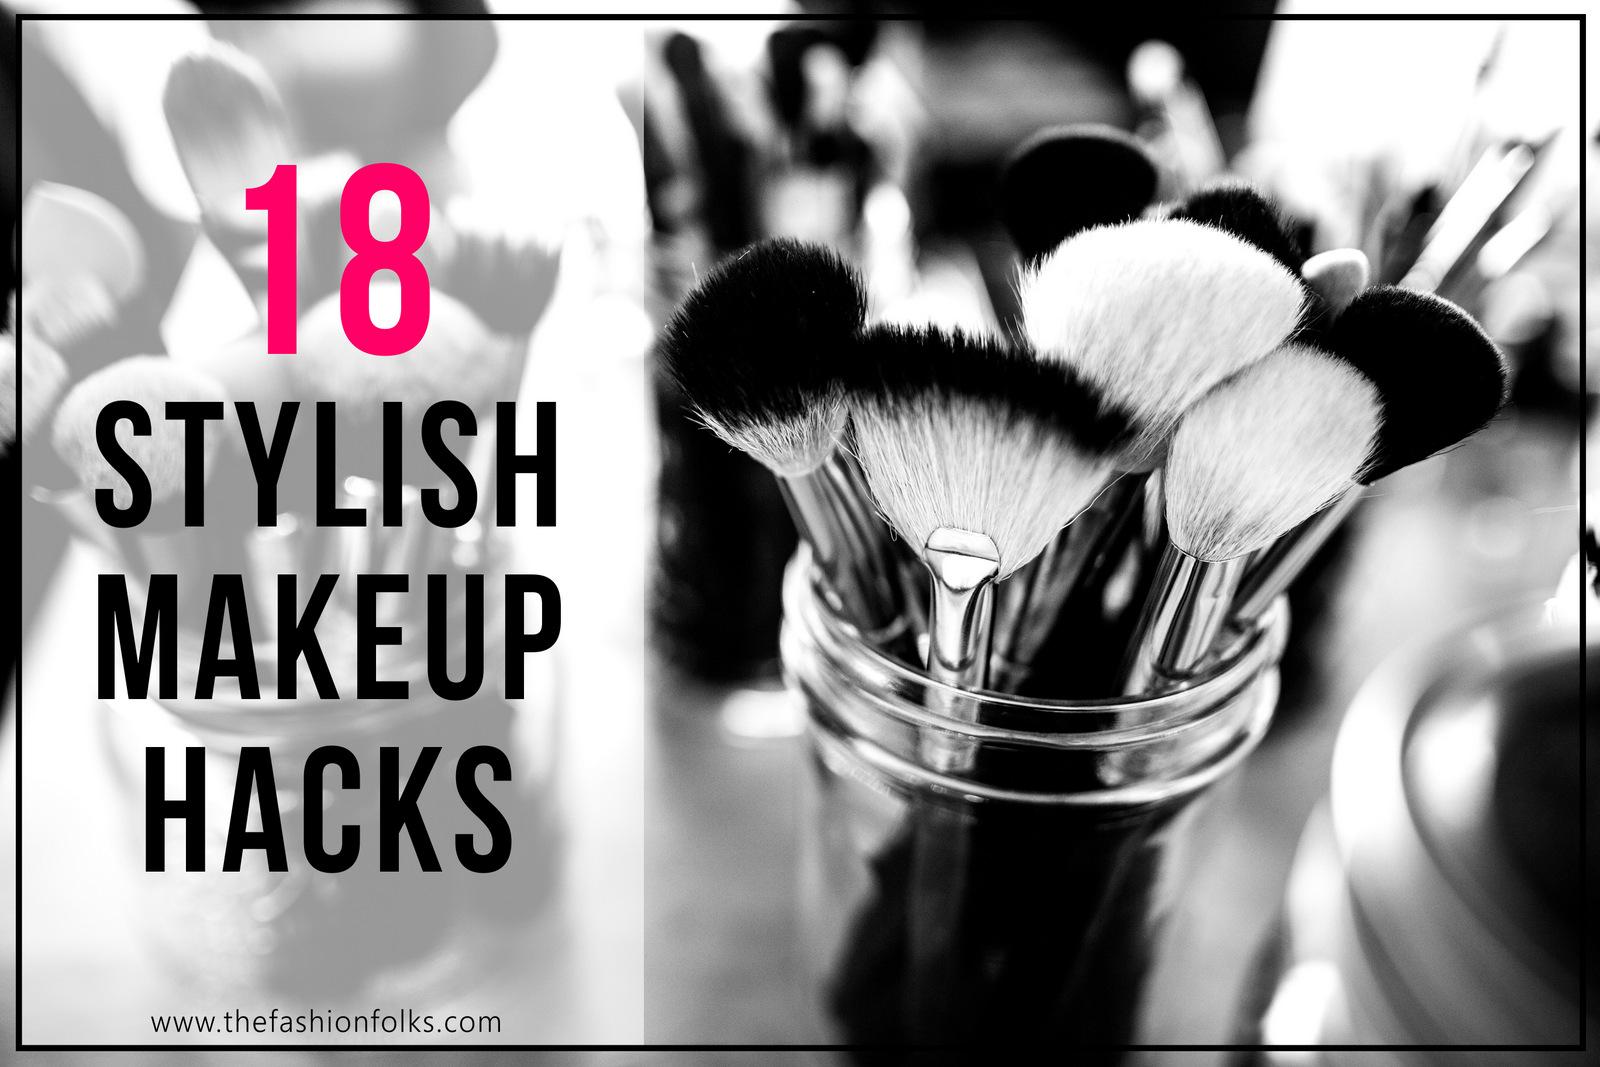 18 Stylish Makeup Hacks | The Fashion Folks